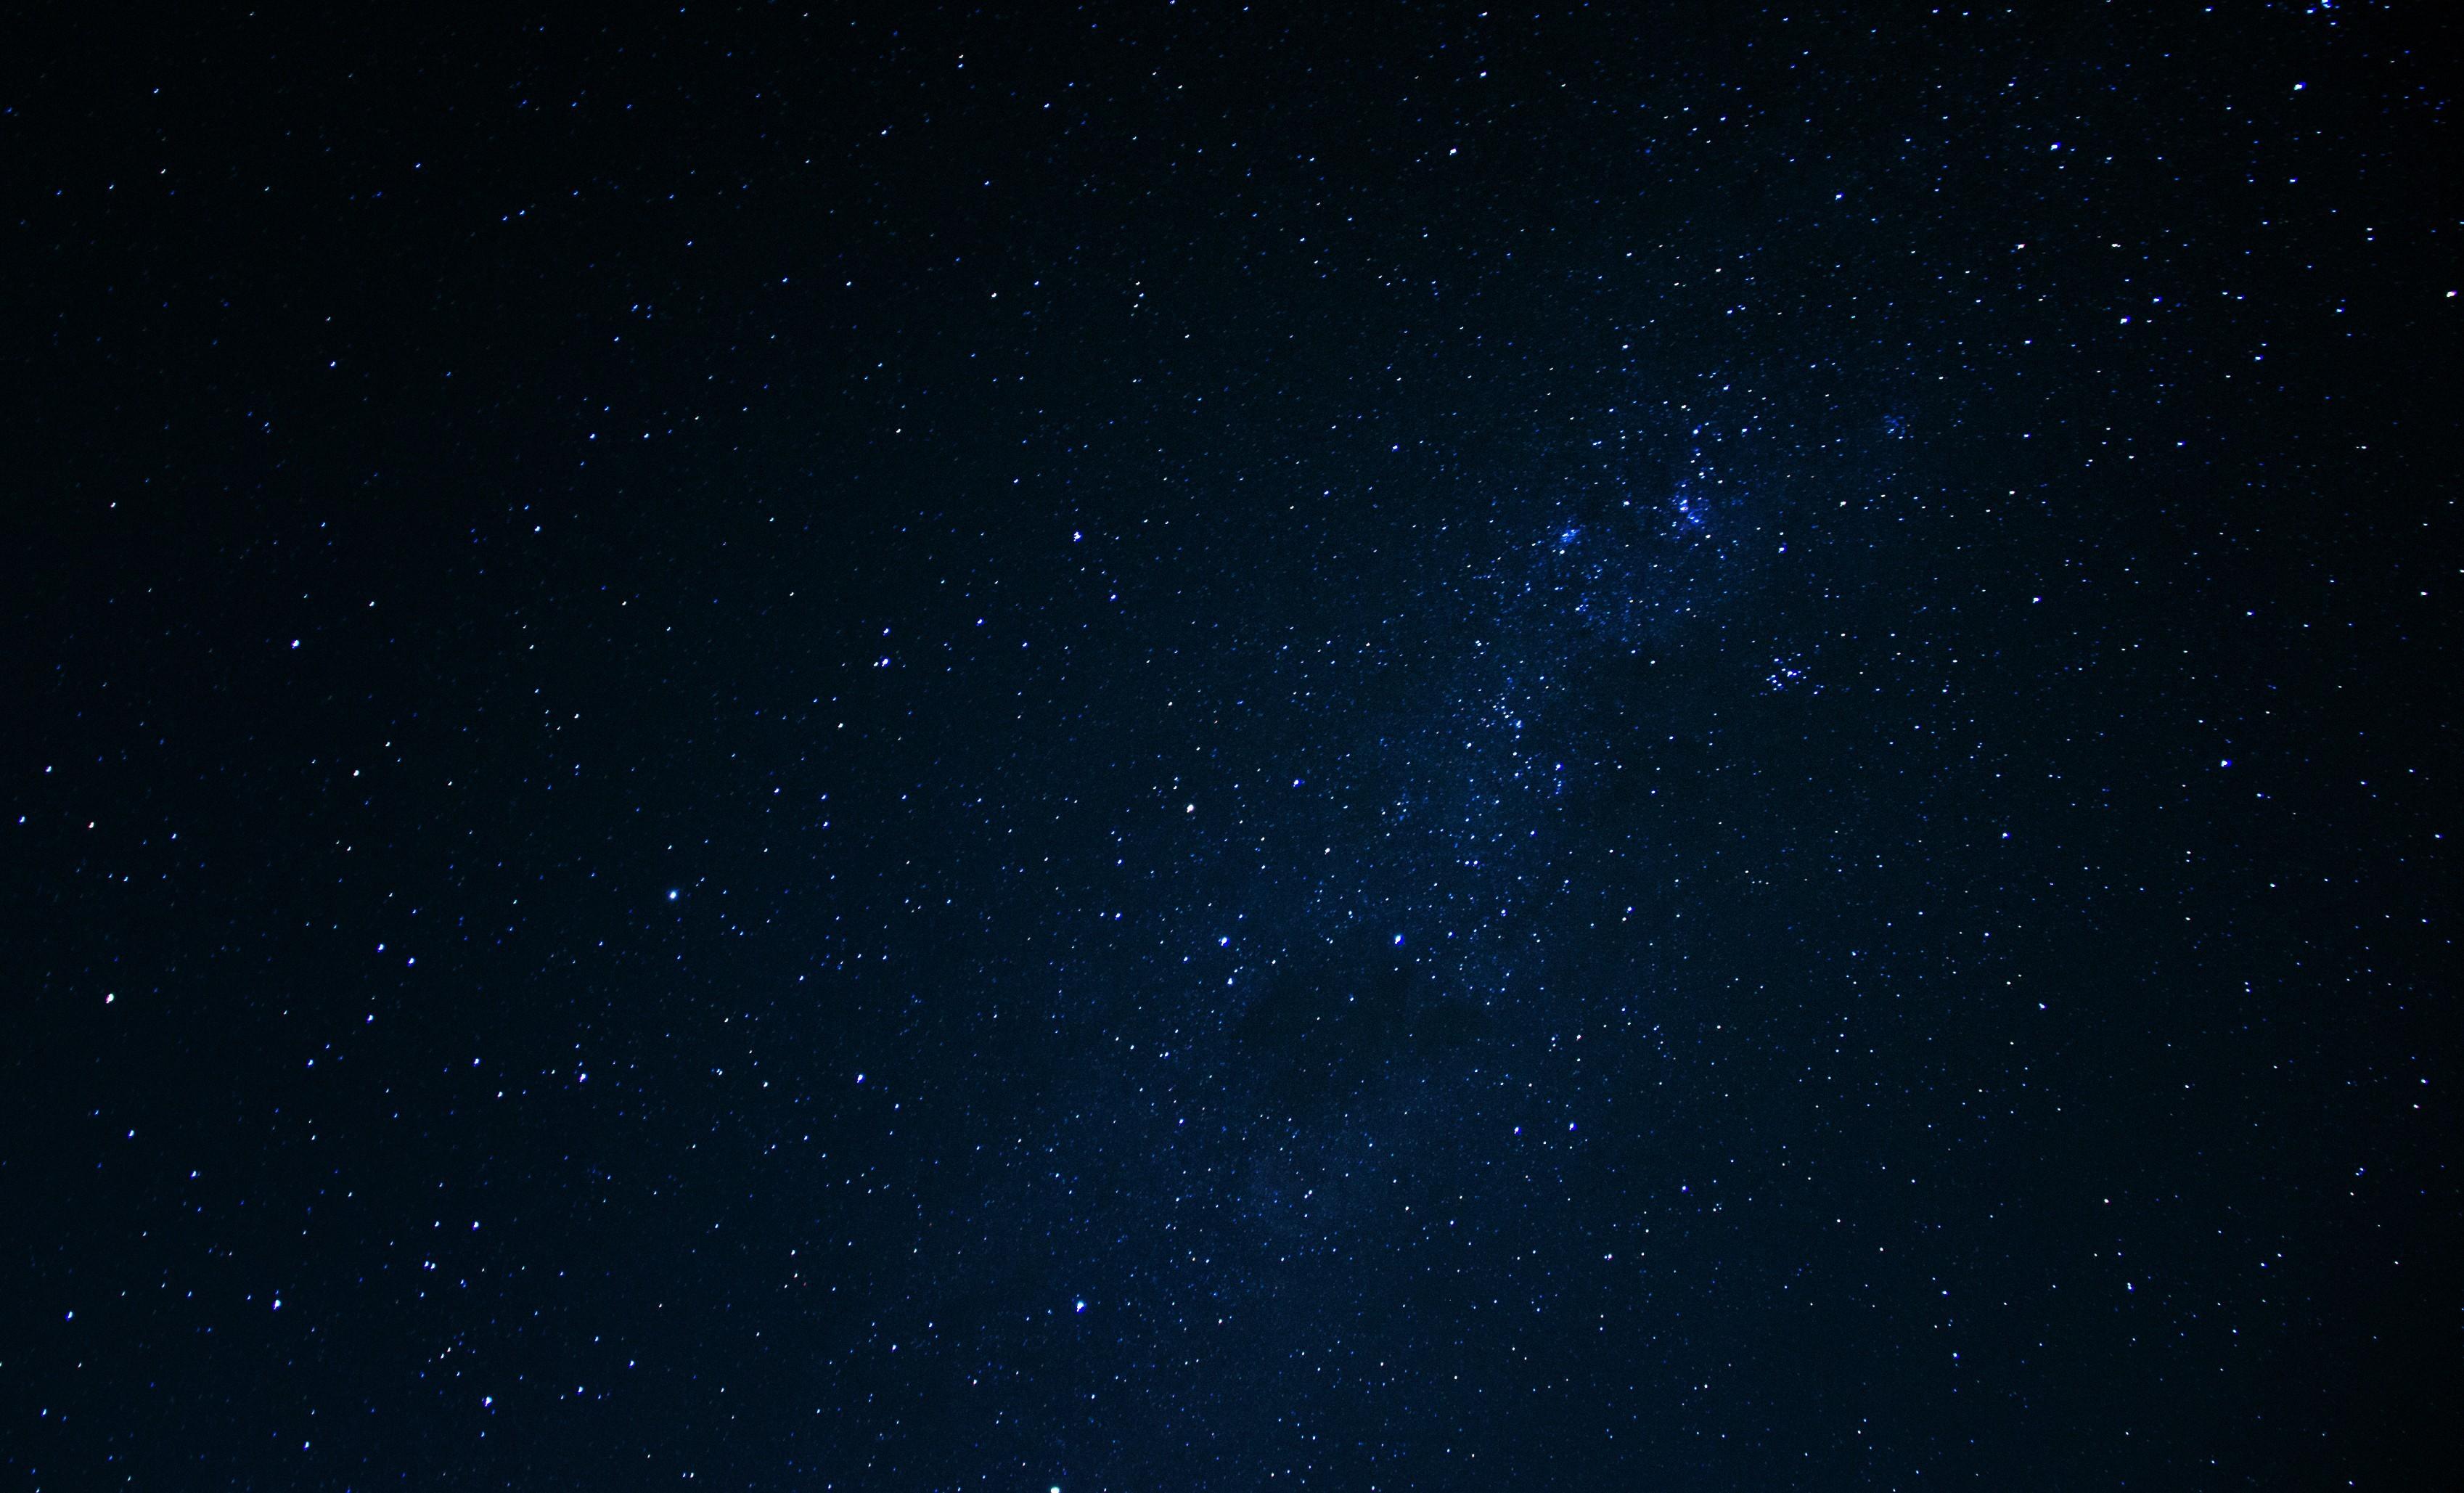 Outer space stars wallpaper 16838 PC en 3395x2057